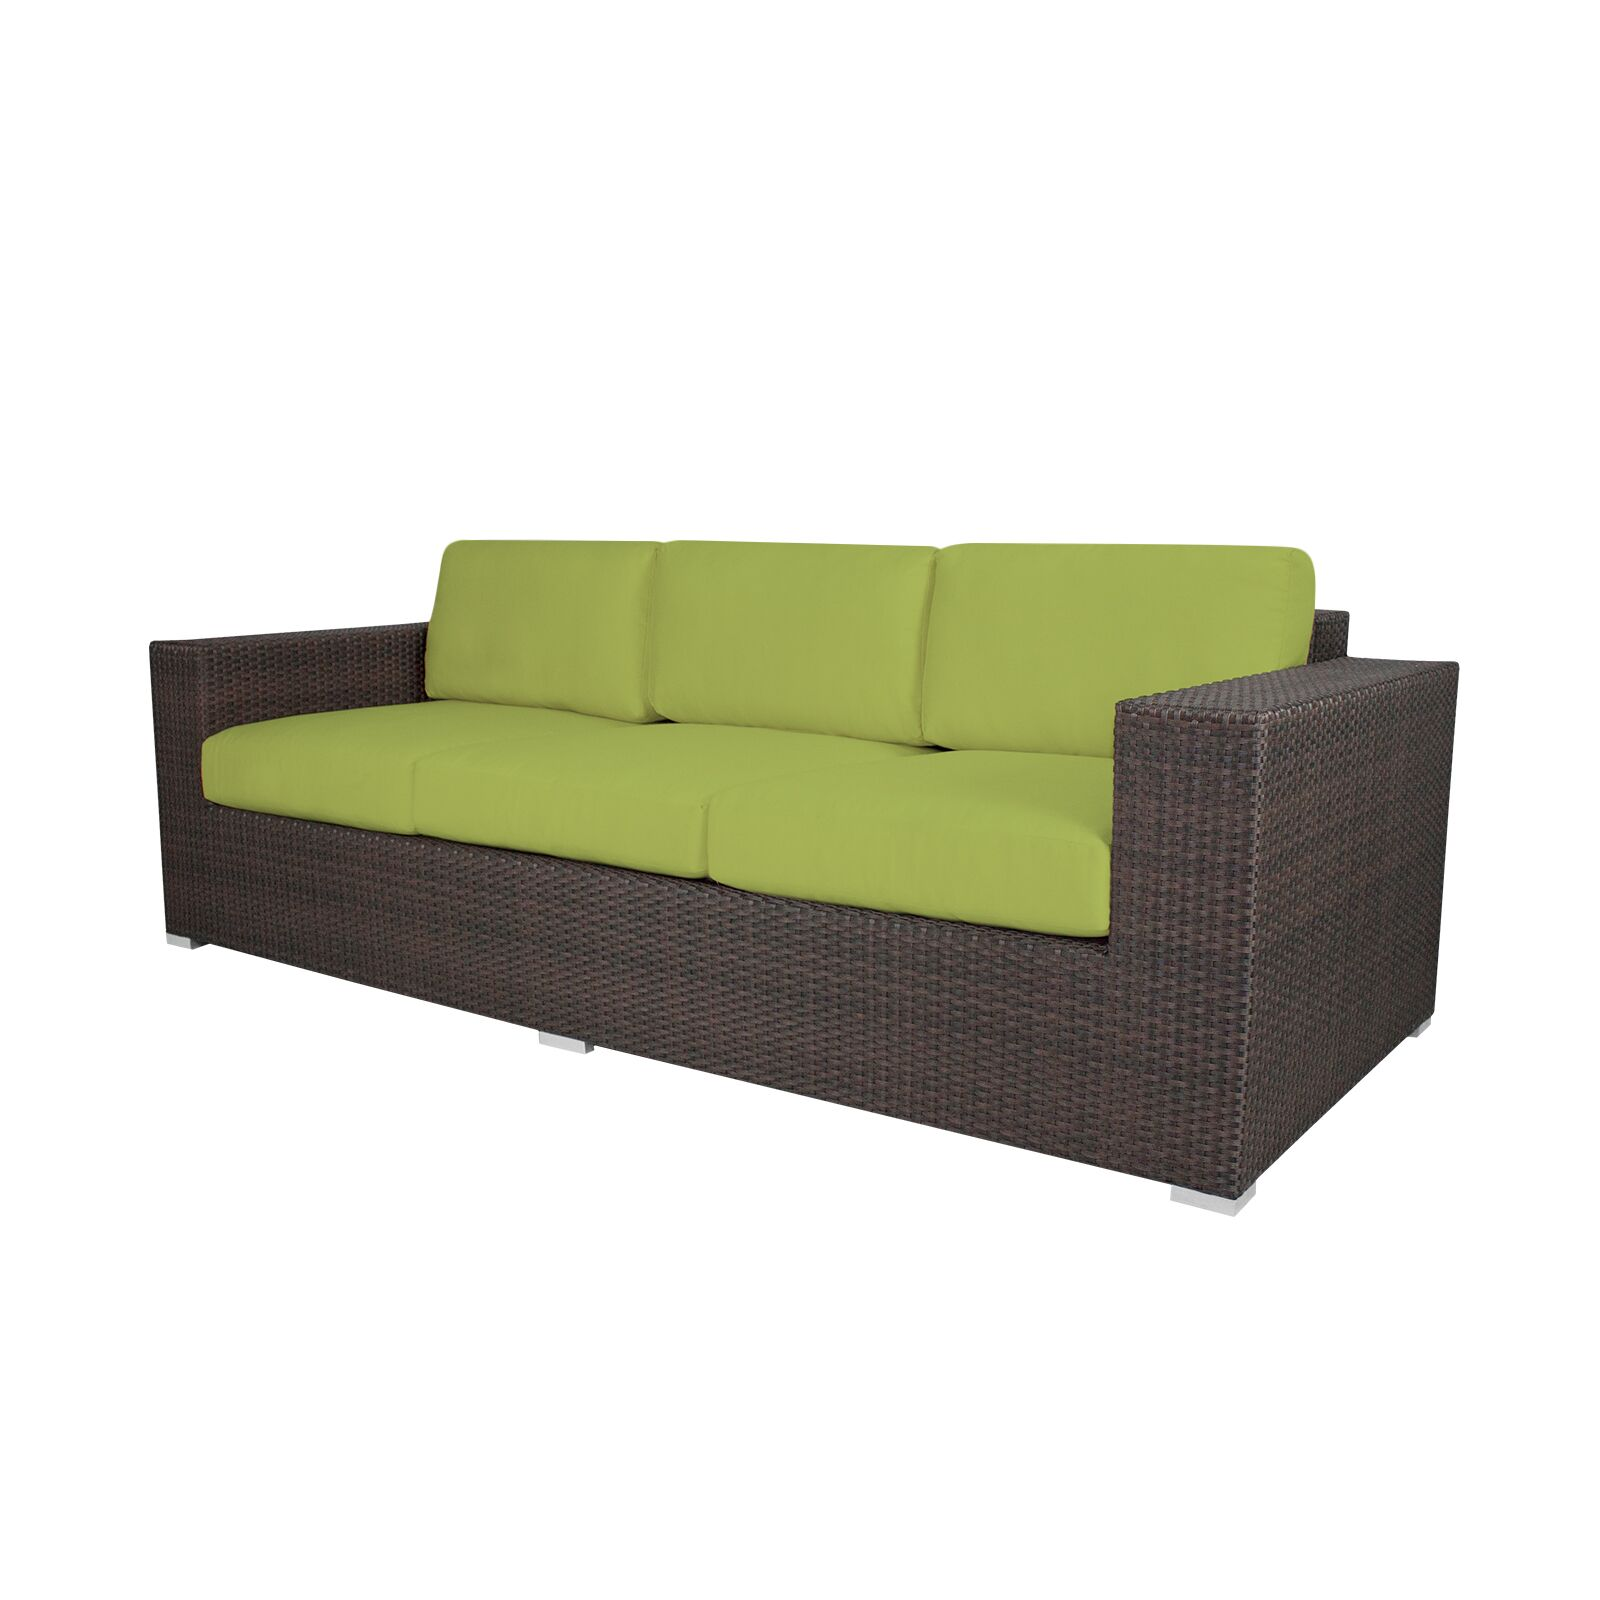 Ropp Patio Sofa with Cushions Color: Sunbrella Parrot